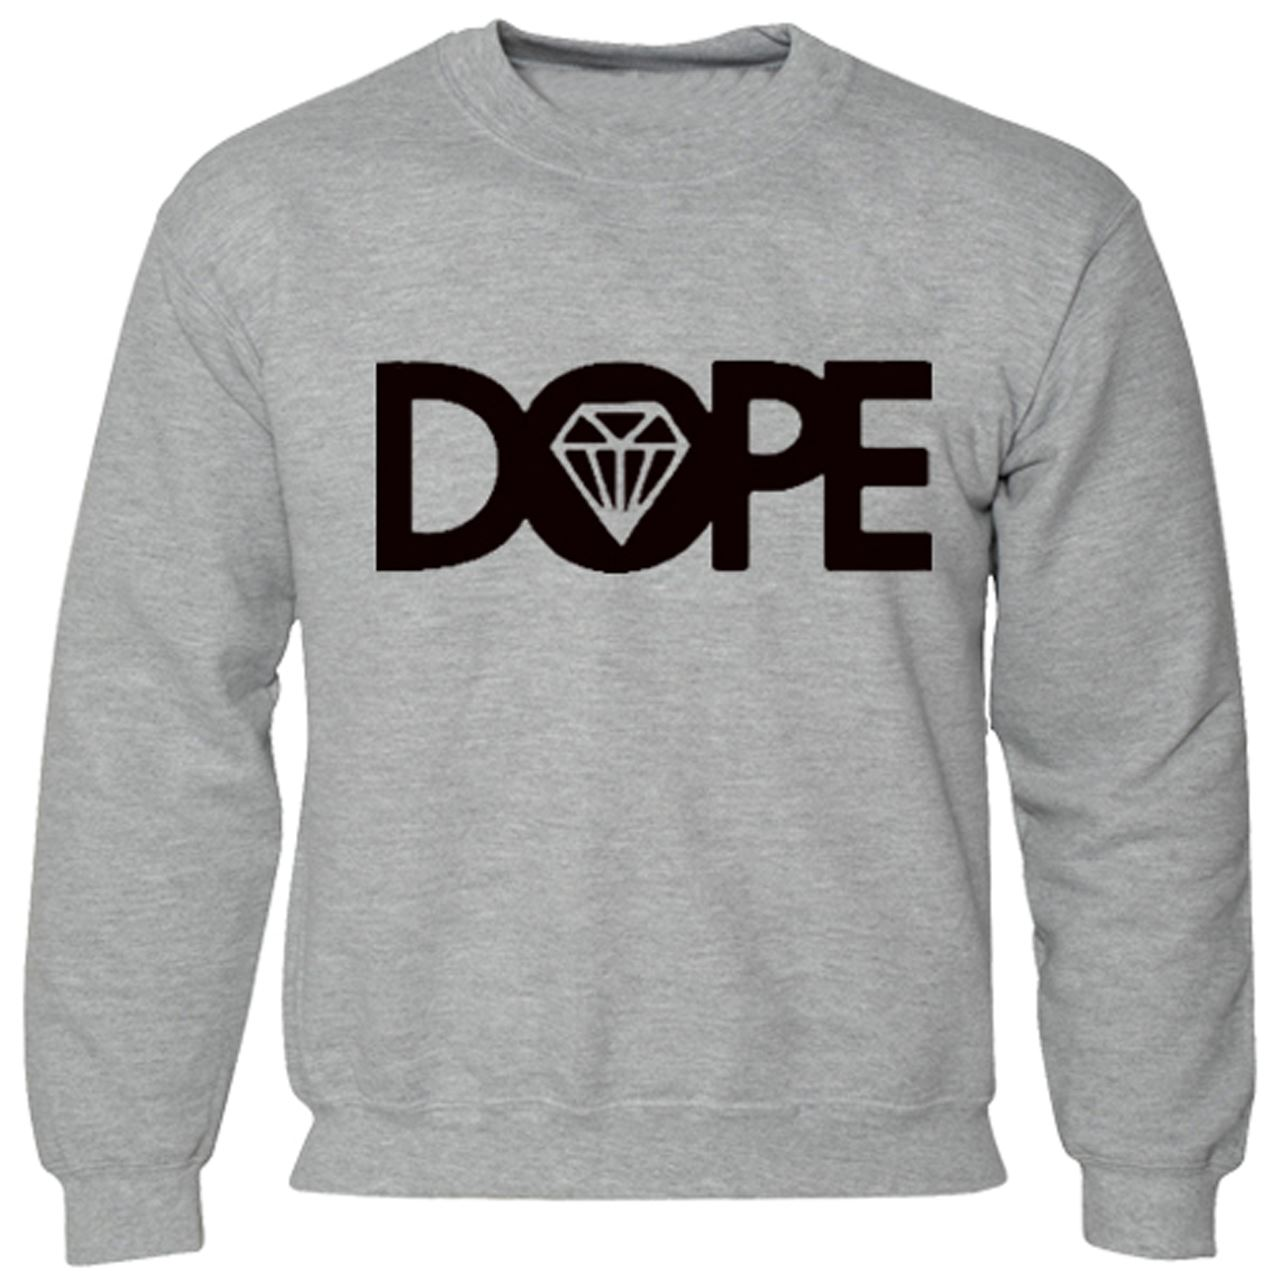 Men Boy Unisex Dope Sweater Hoodie New Jumper Diamond Sweat Shirt ...